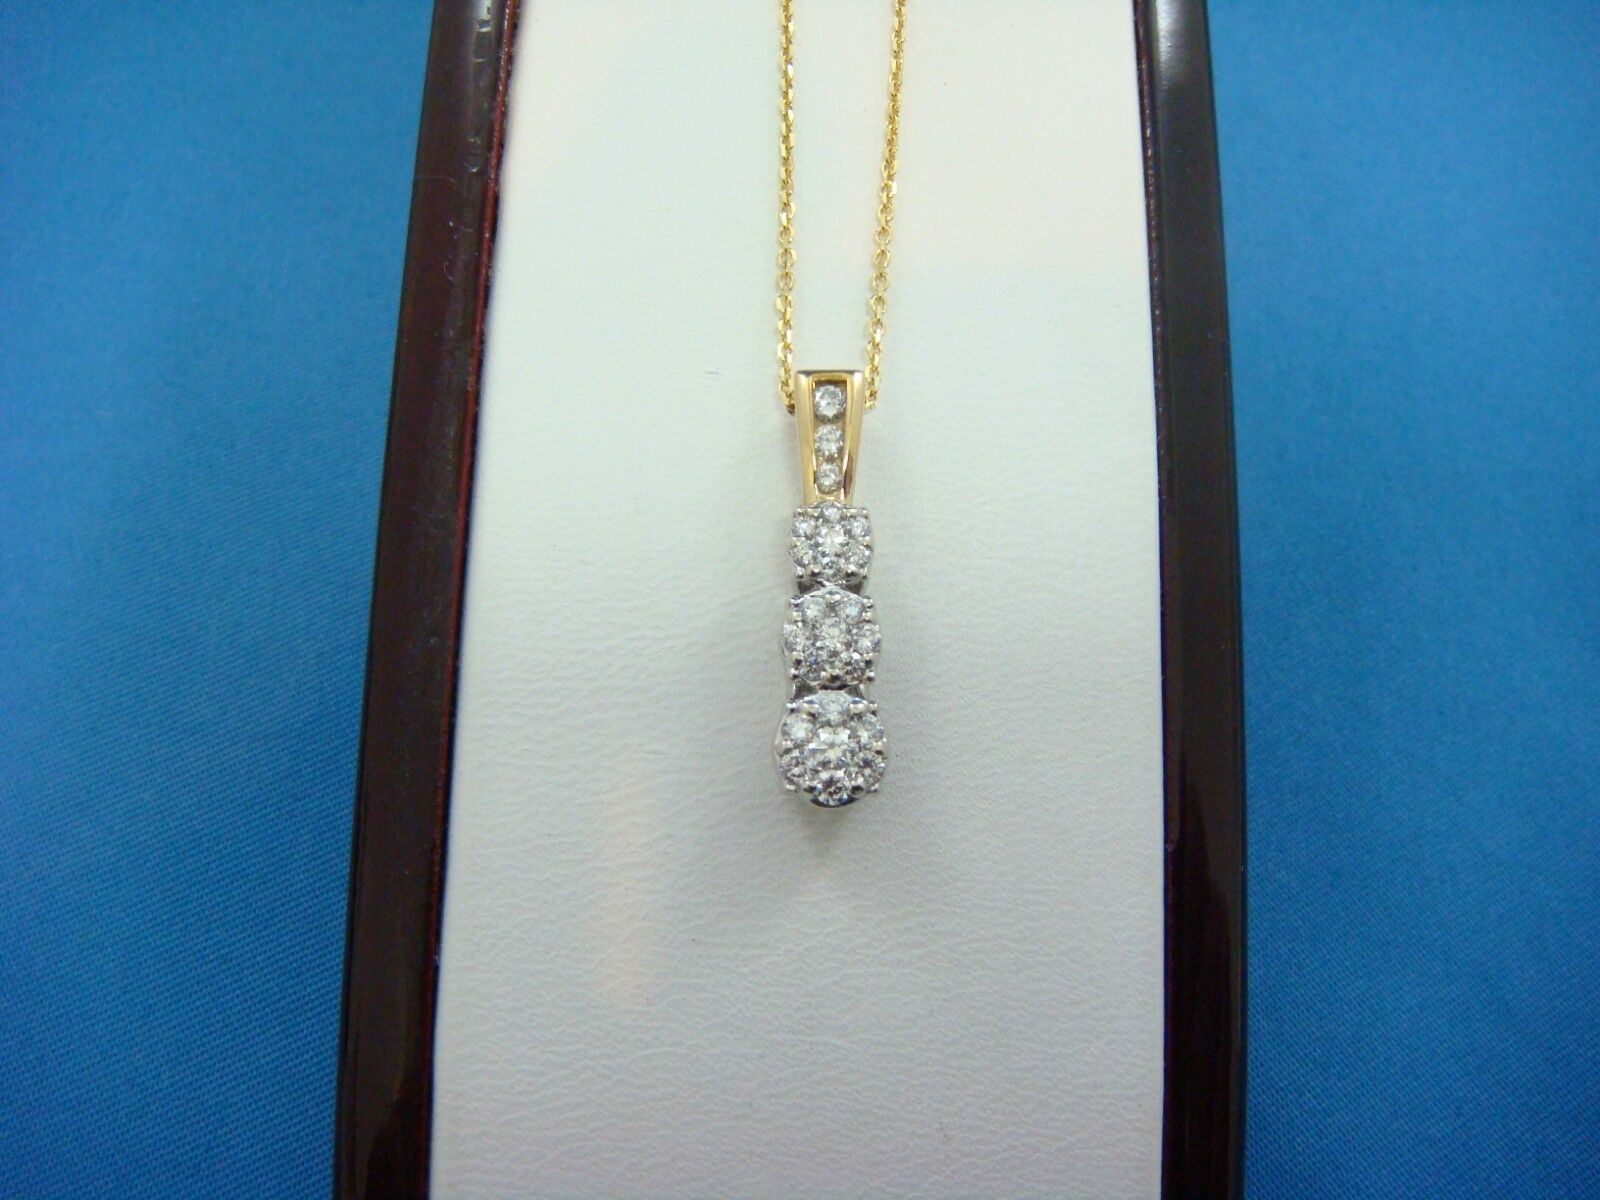 14K 2 TONE gold 0.75 CTT.W. PAST, PRESENT, FUTURE FLOWER DESIGN DIAMOND PENDANT